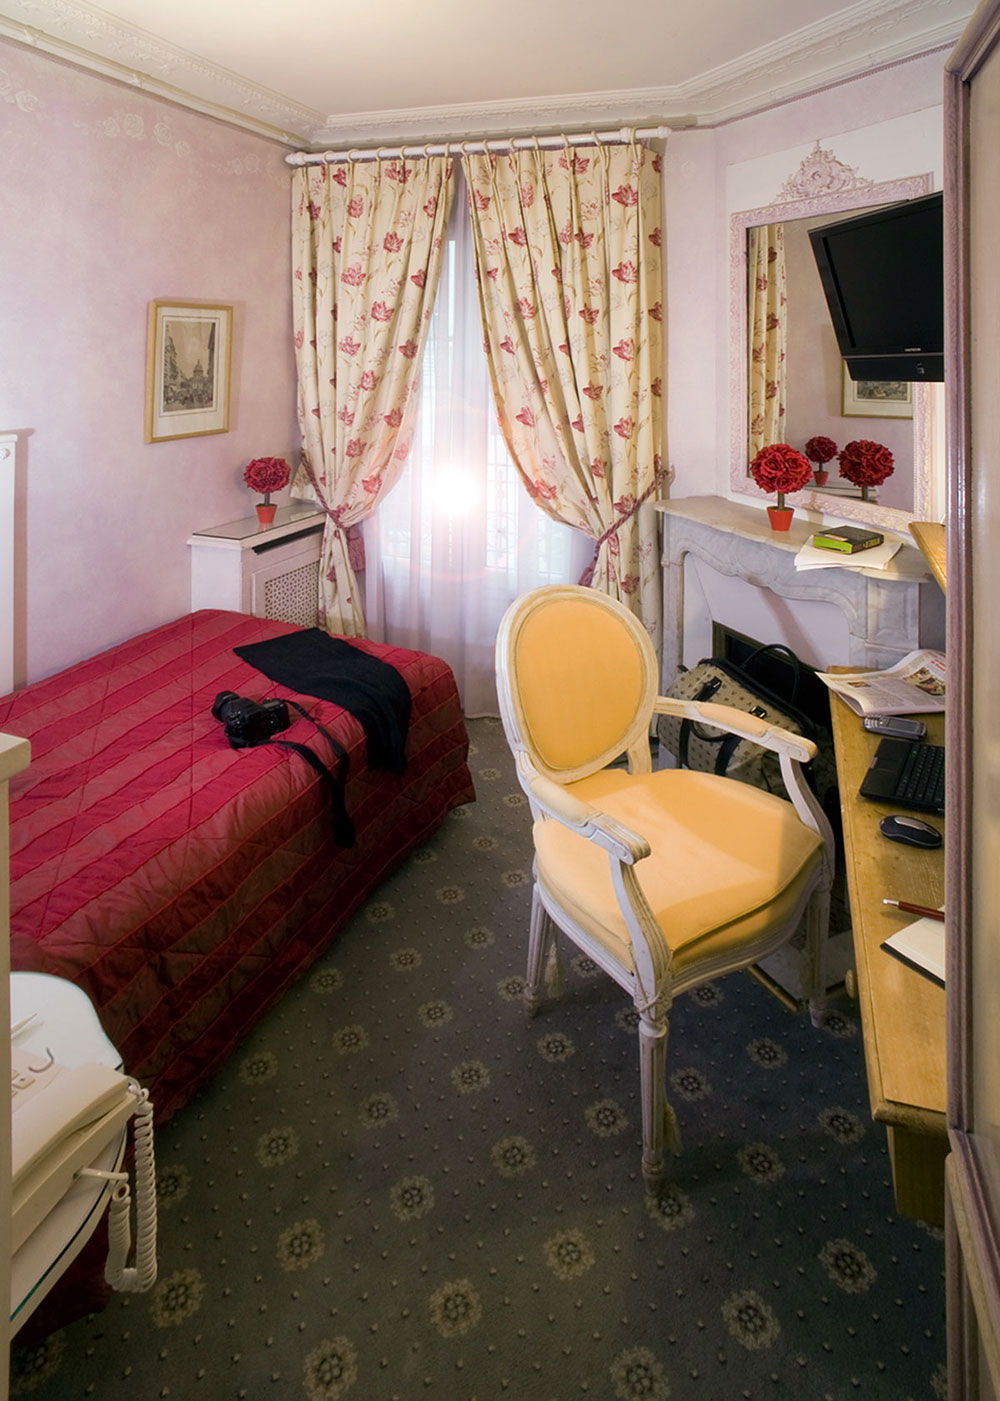 Chambre standard 1 personne hotel gavarni paris for Hotel paris chambre 5 personnes